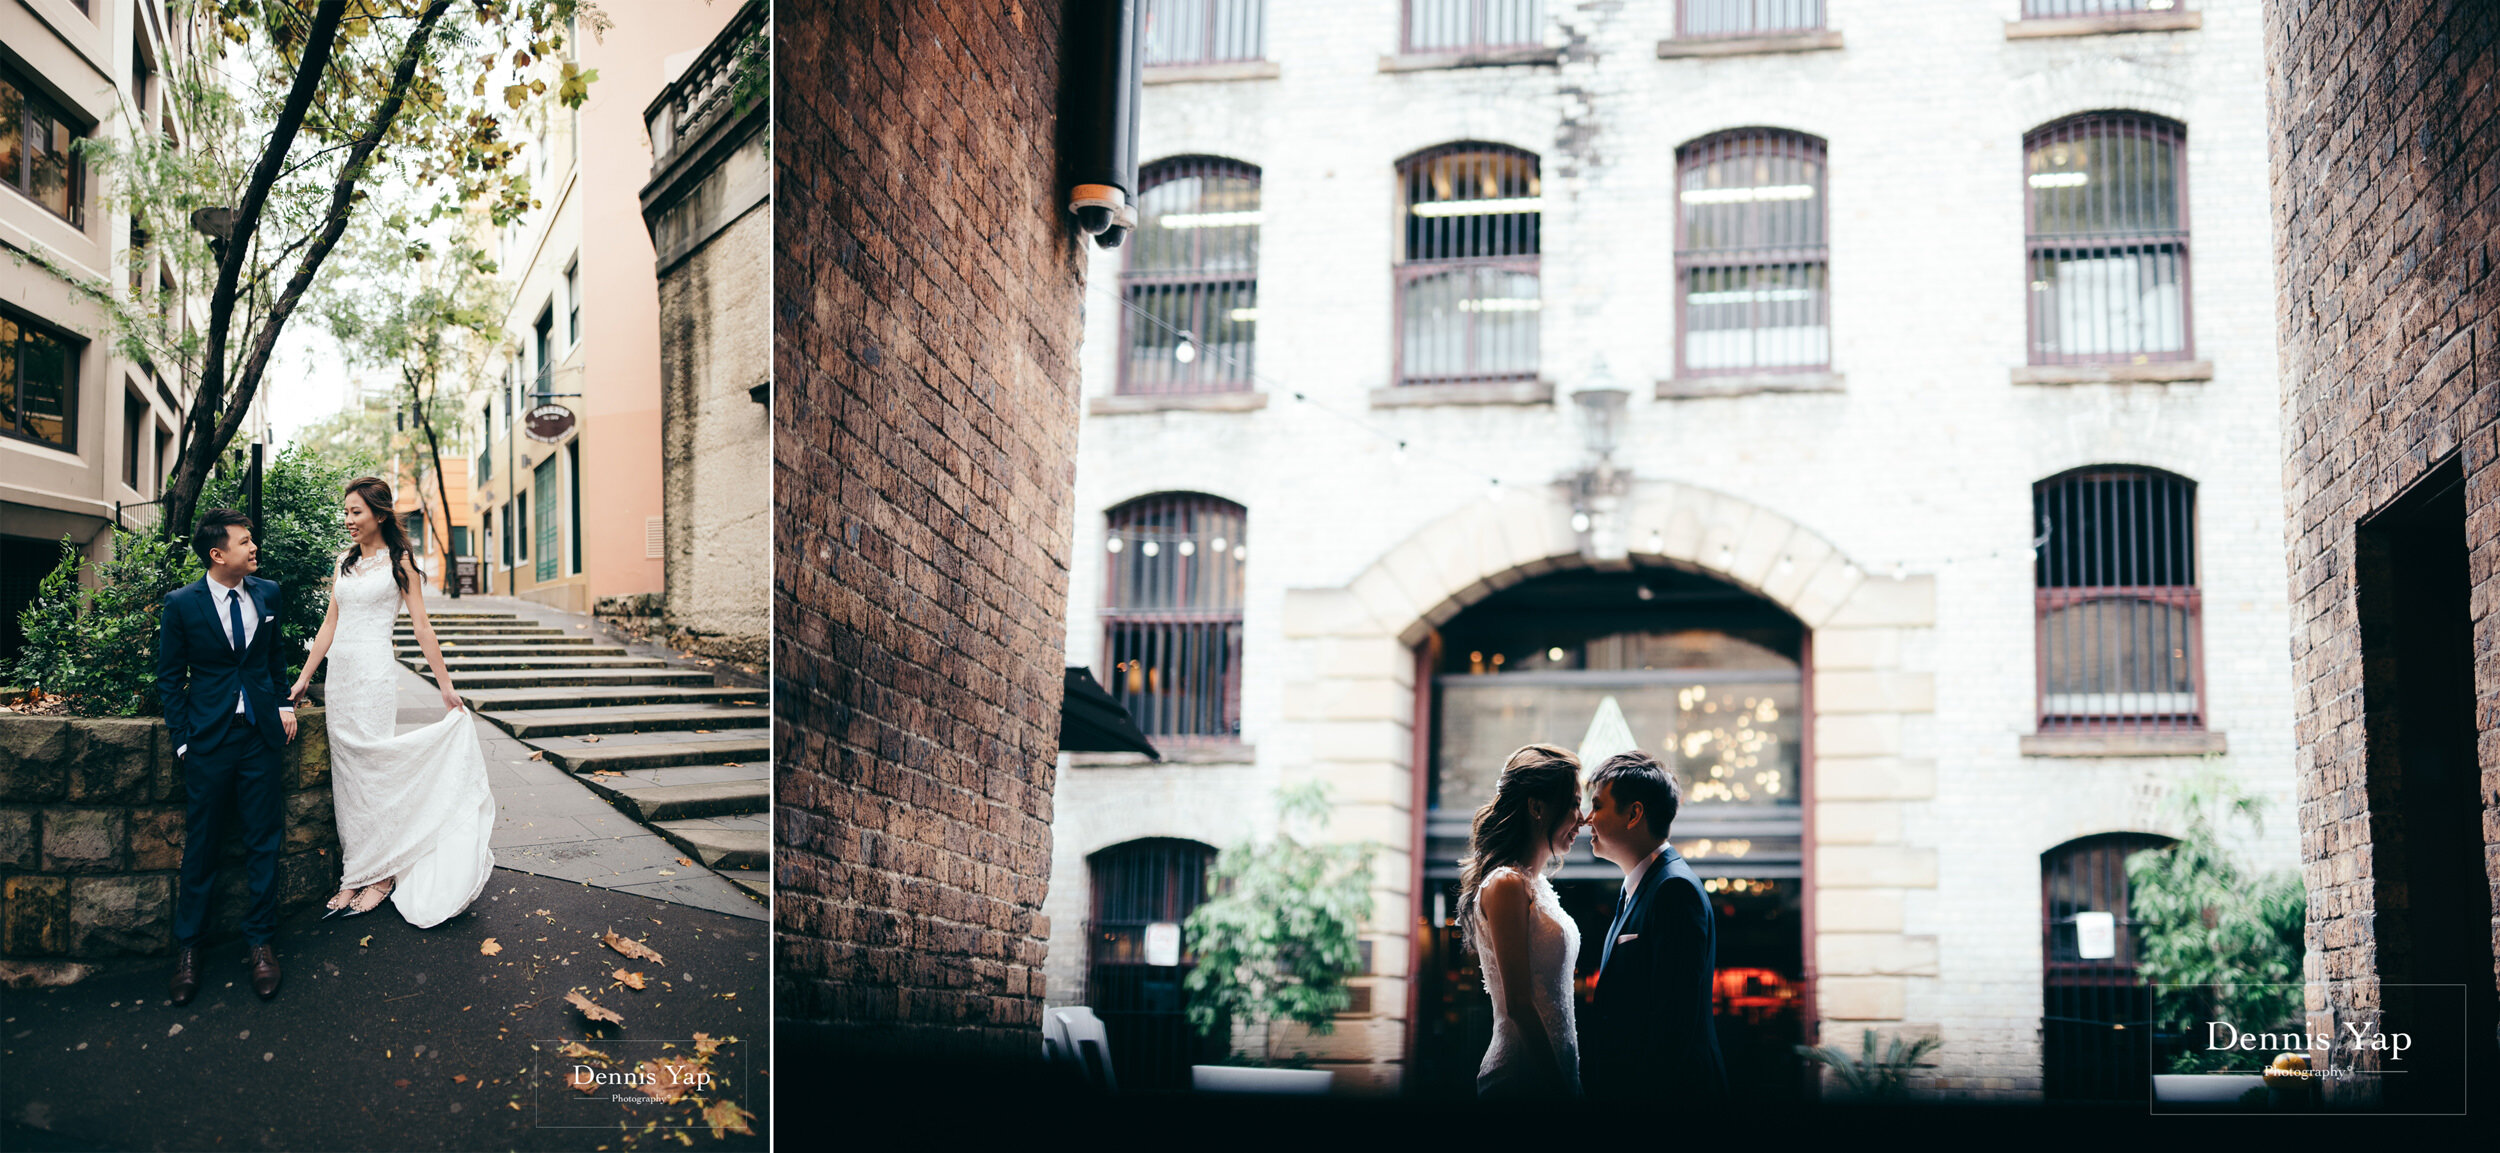 jason courtney pre wedding sydney dennis yap photography-112.jpg